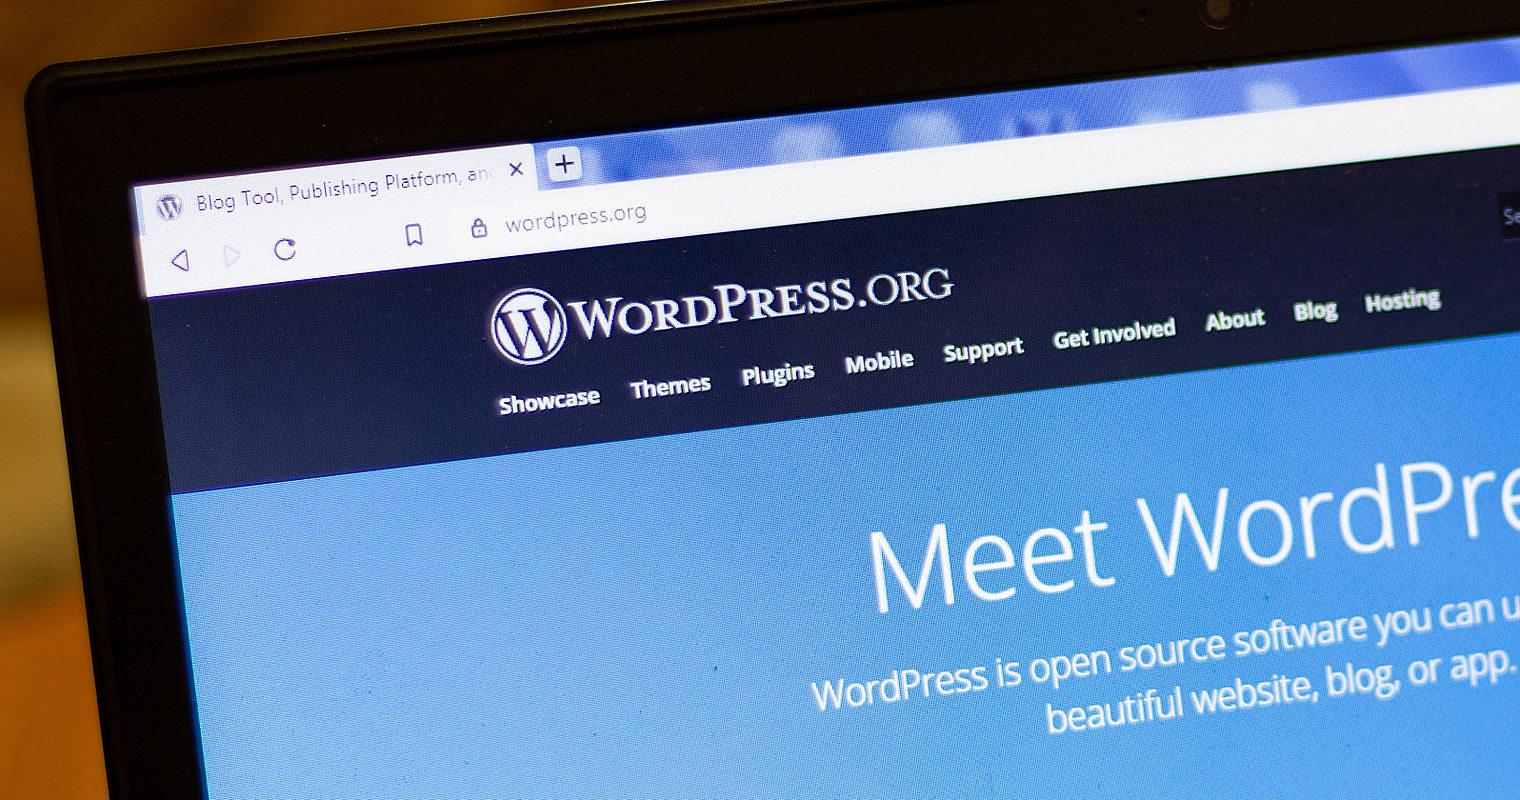 WordPress Powers 39.5% of All Websites